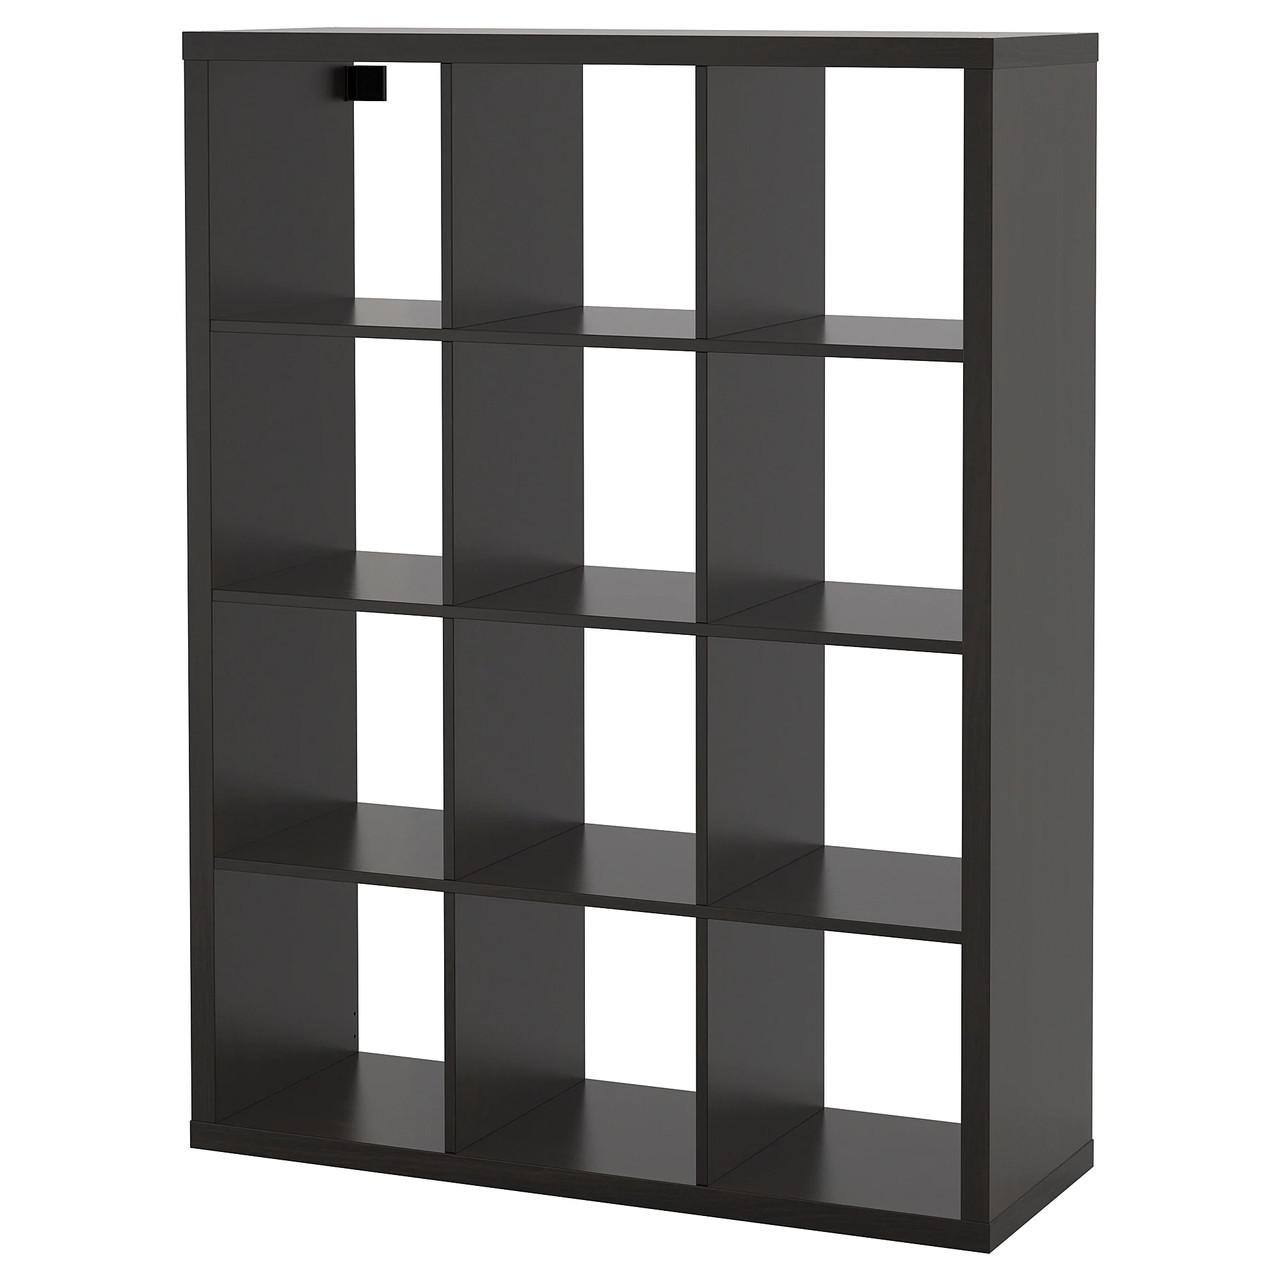 ікеа каллакс стеллаж черно коричневый 3 588 грн інші меблі